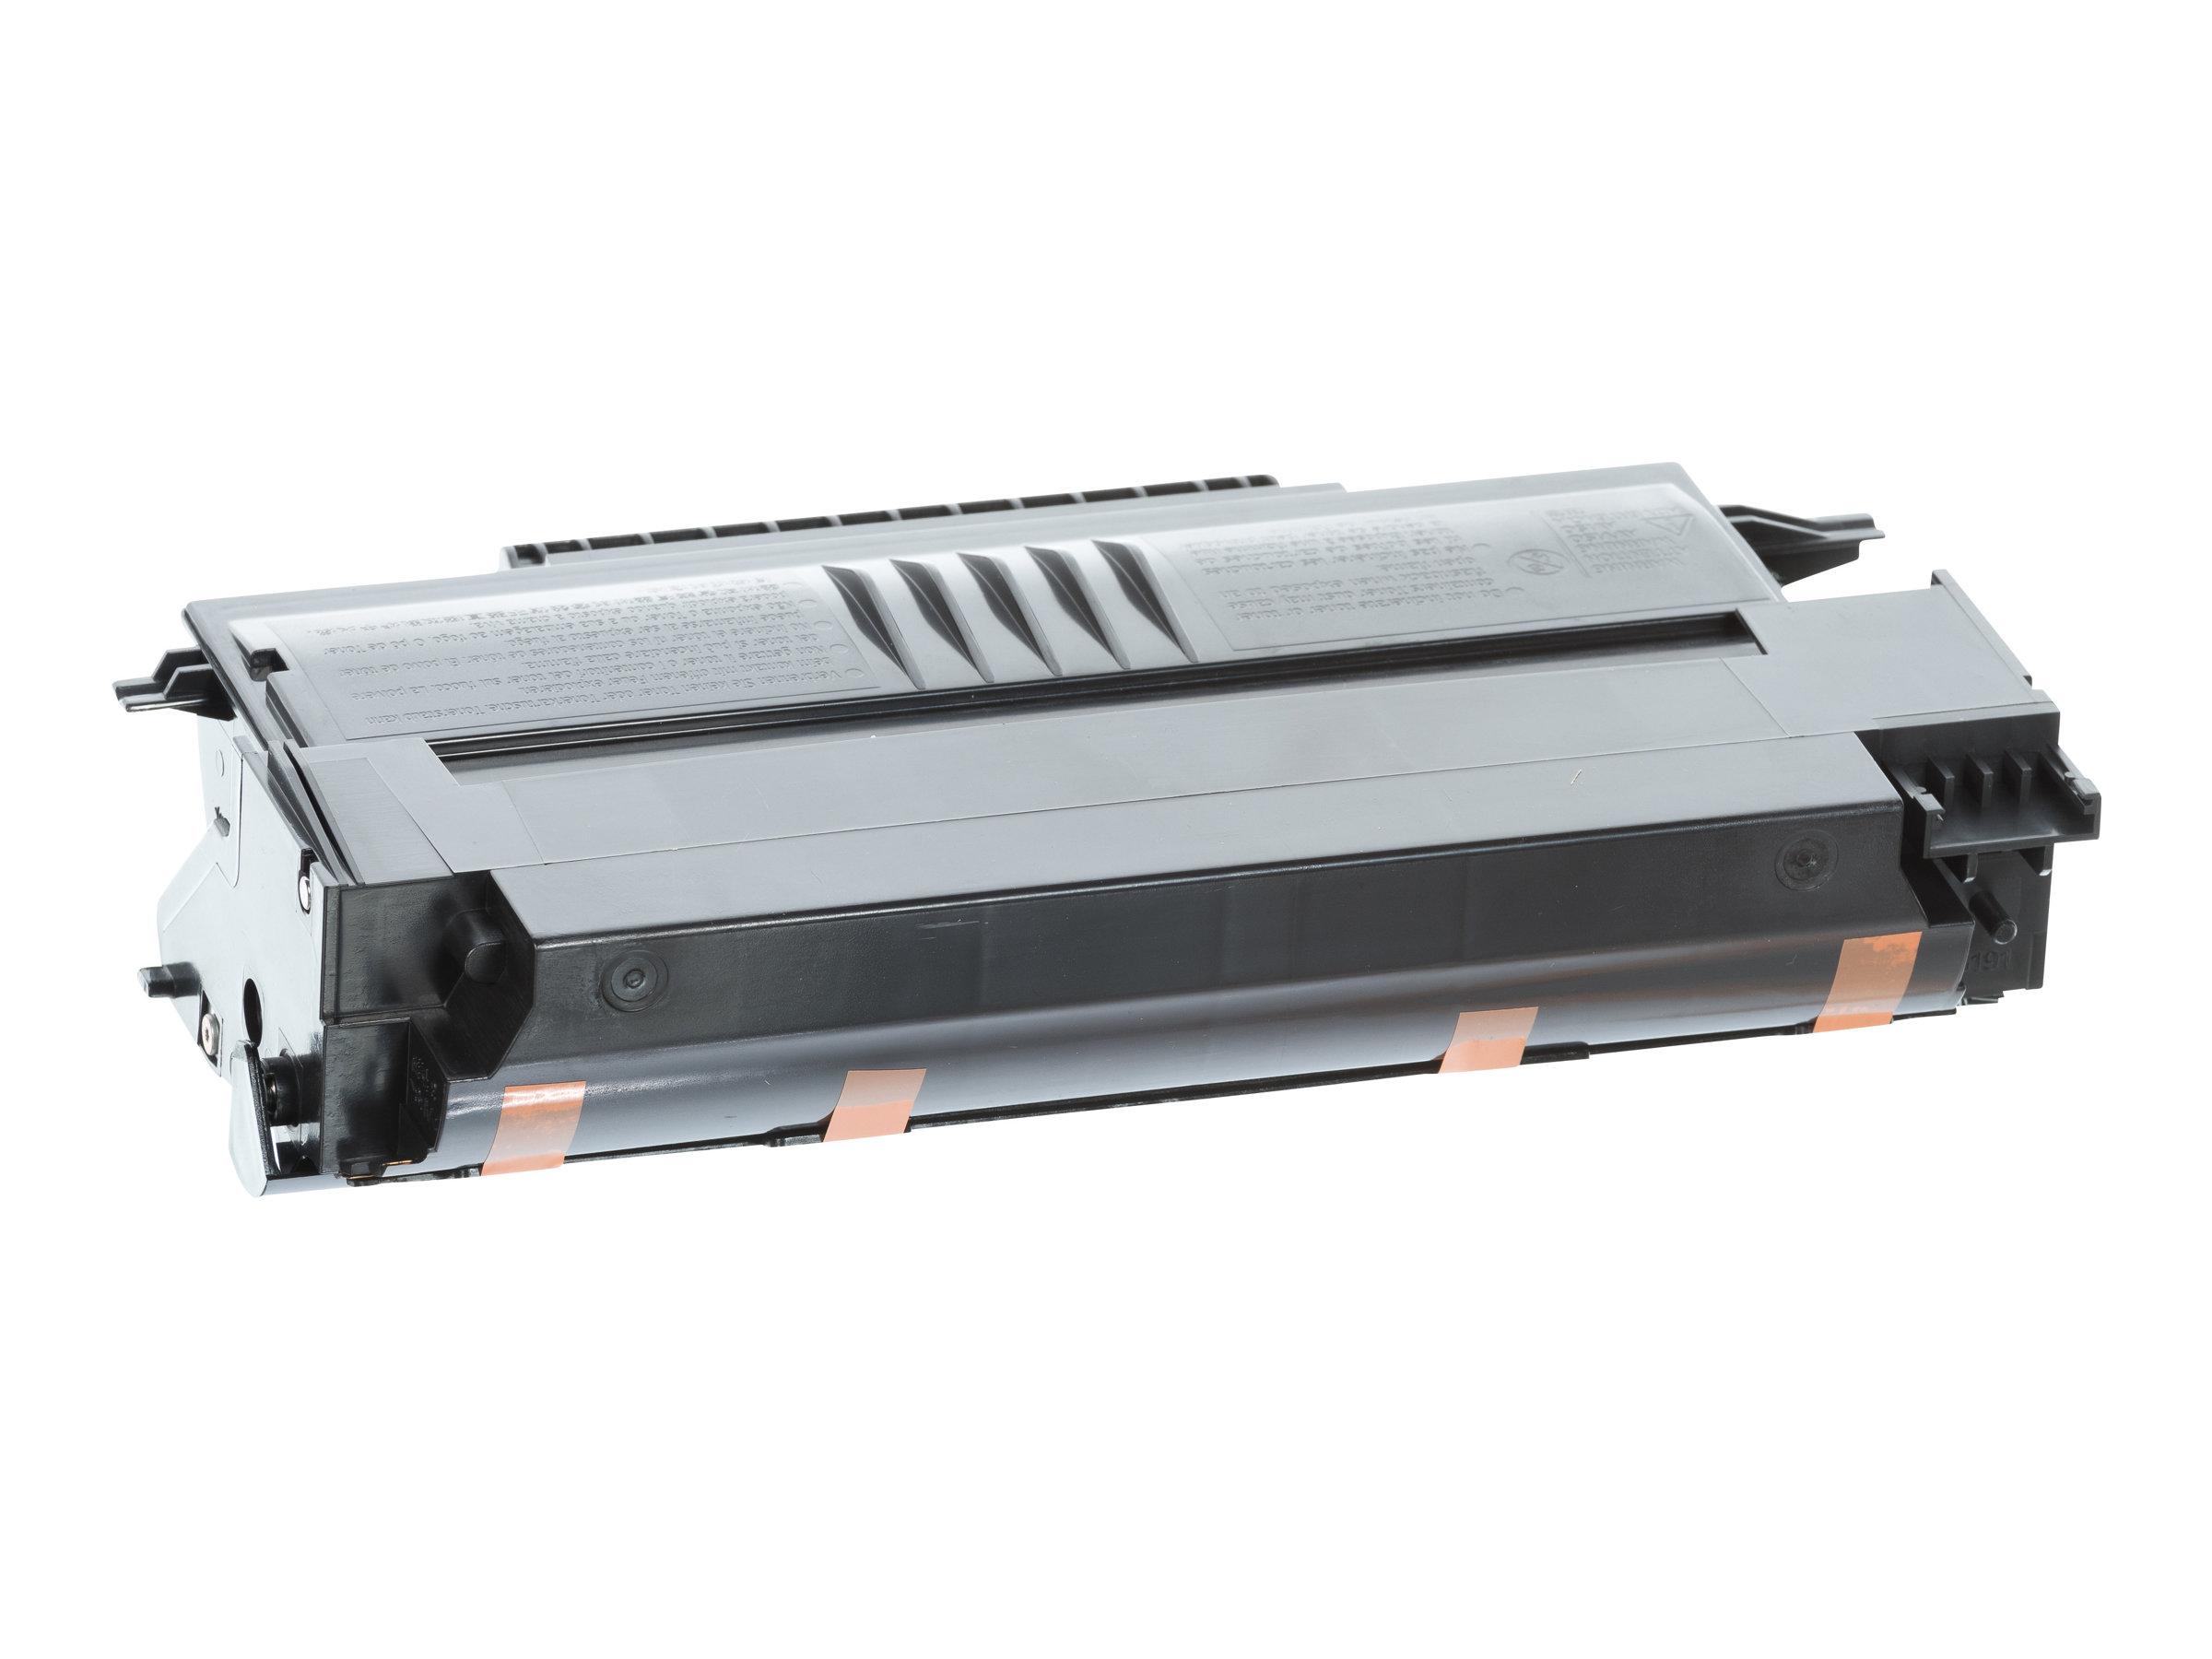 Ricoh - Schwarz - Original - Tonerpatrone - für Lanier SP 1100; Gestetner SP 1100; Nashuatec SP 1100; NRG SP 1100; Rex Rotary SP